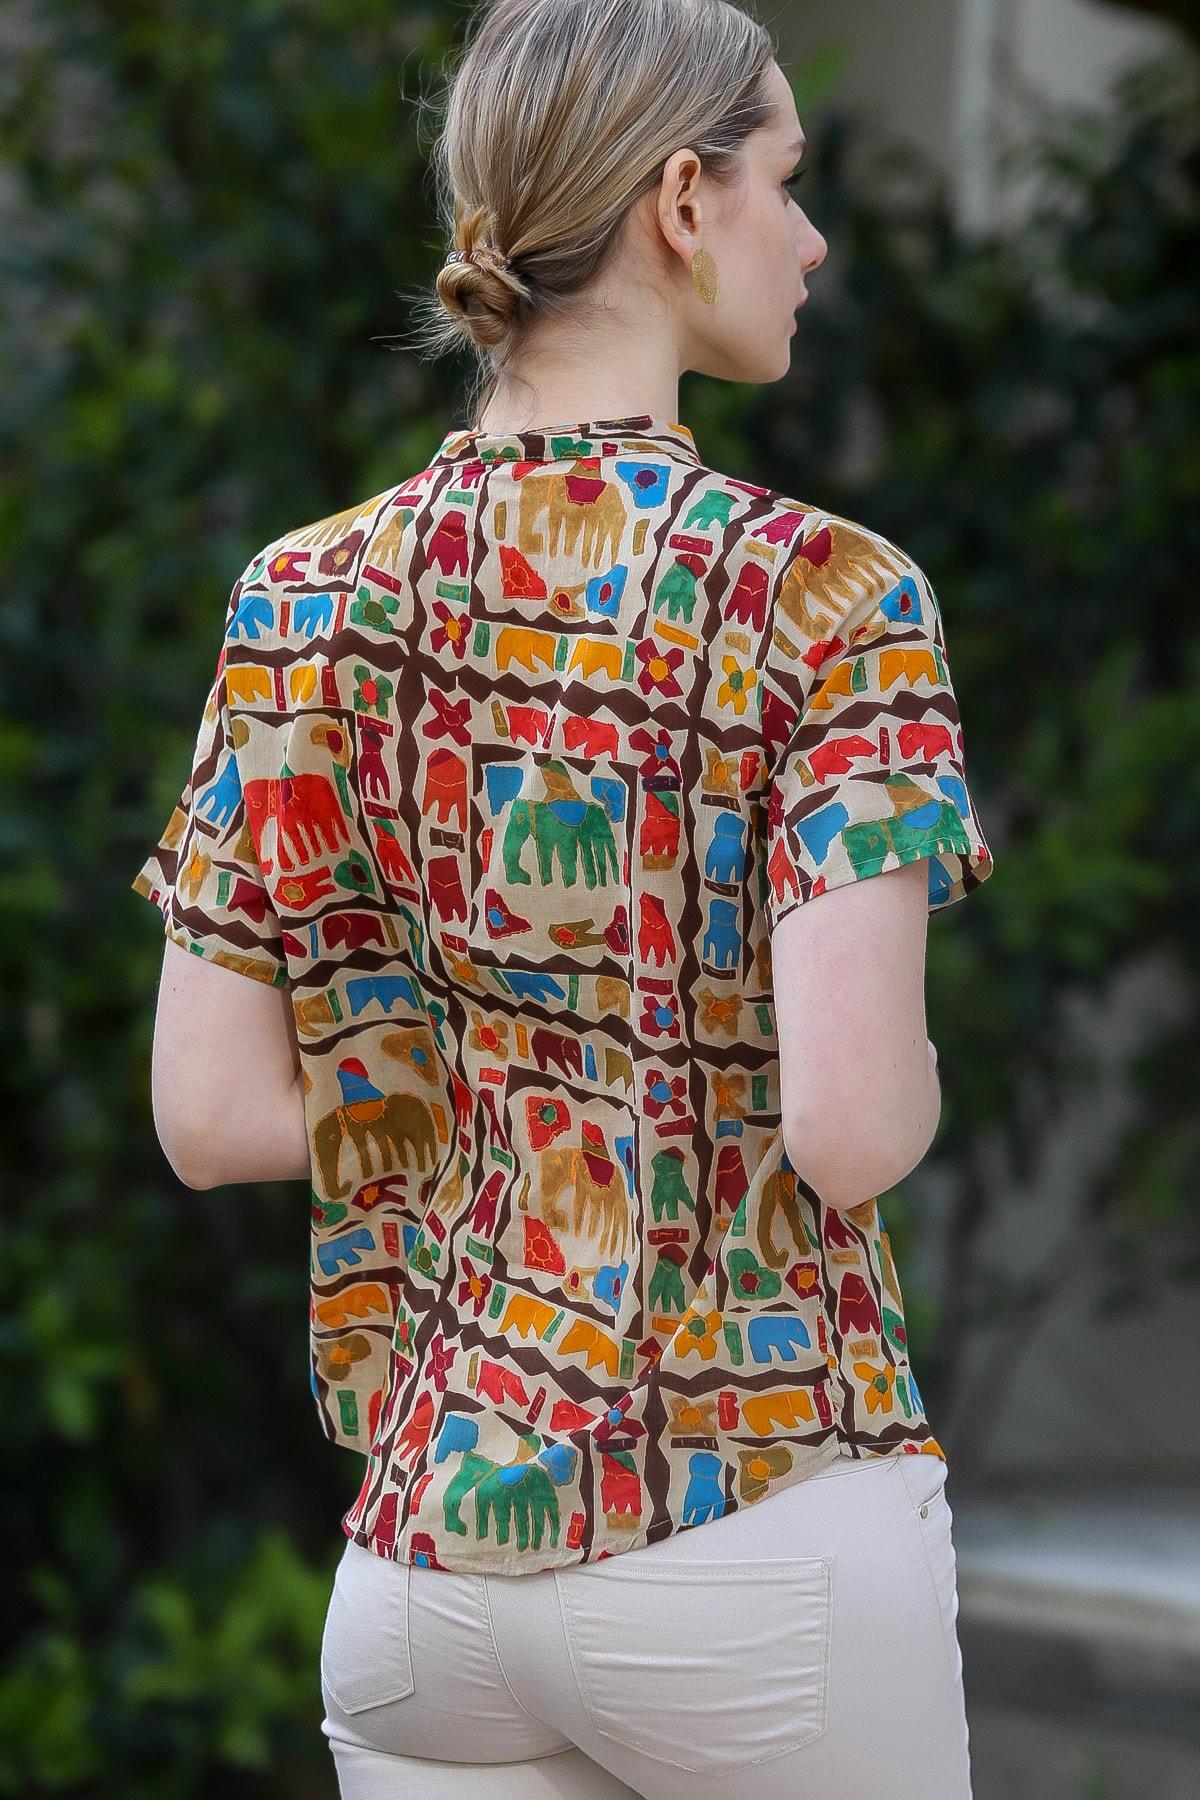 Chiccy Kadın Bej Yakasız Düğme Detaylı Fil Desenli Dokuma Bluz M10010200BL95376 3